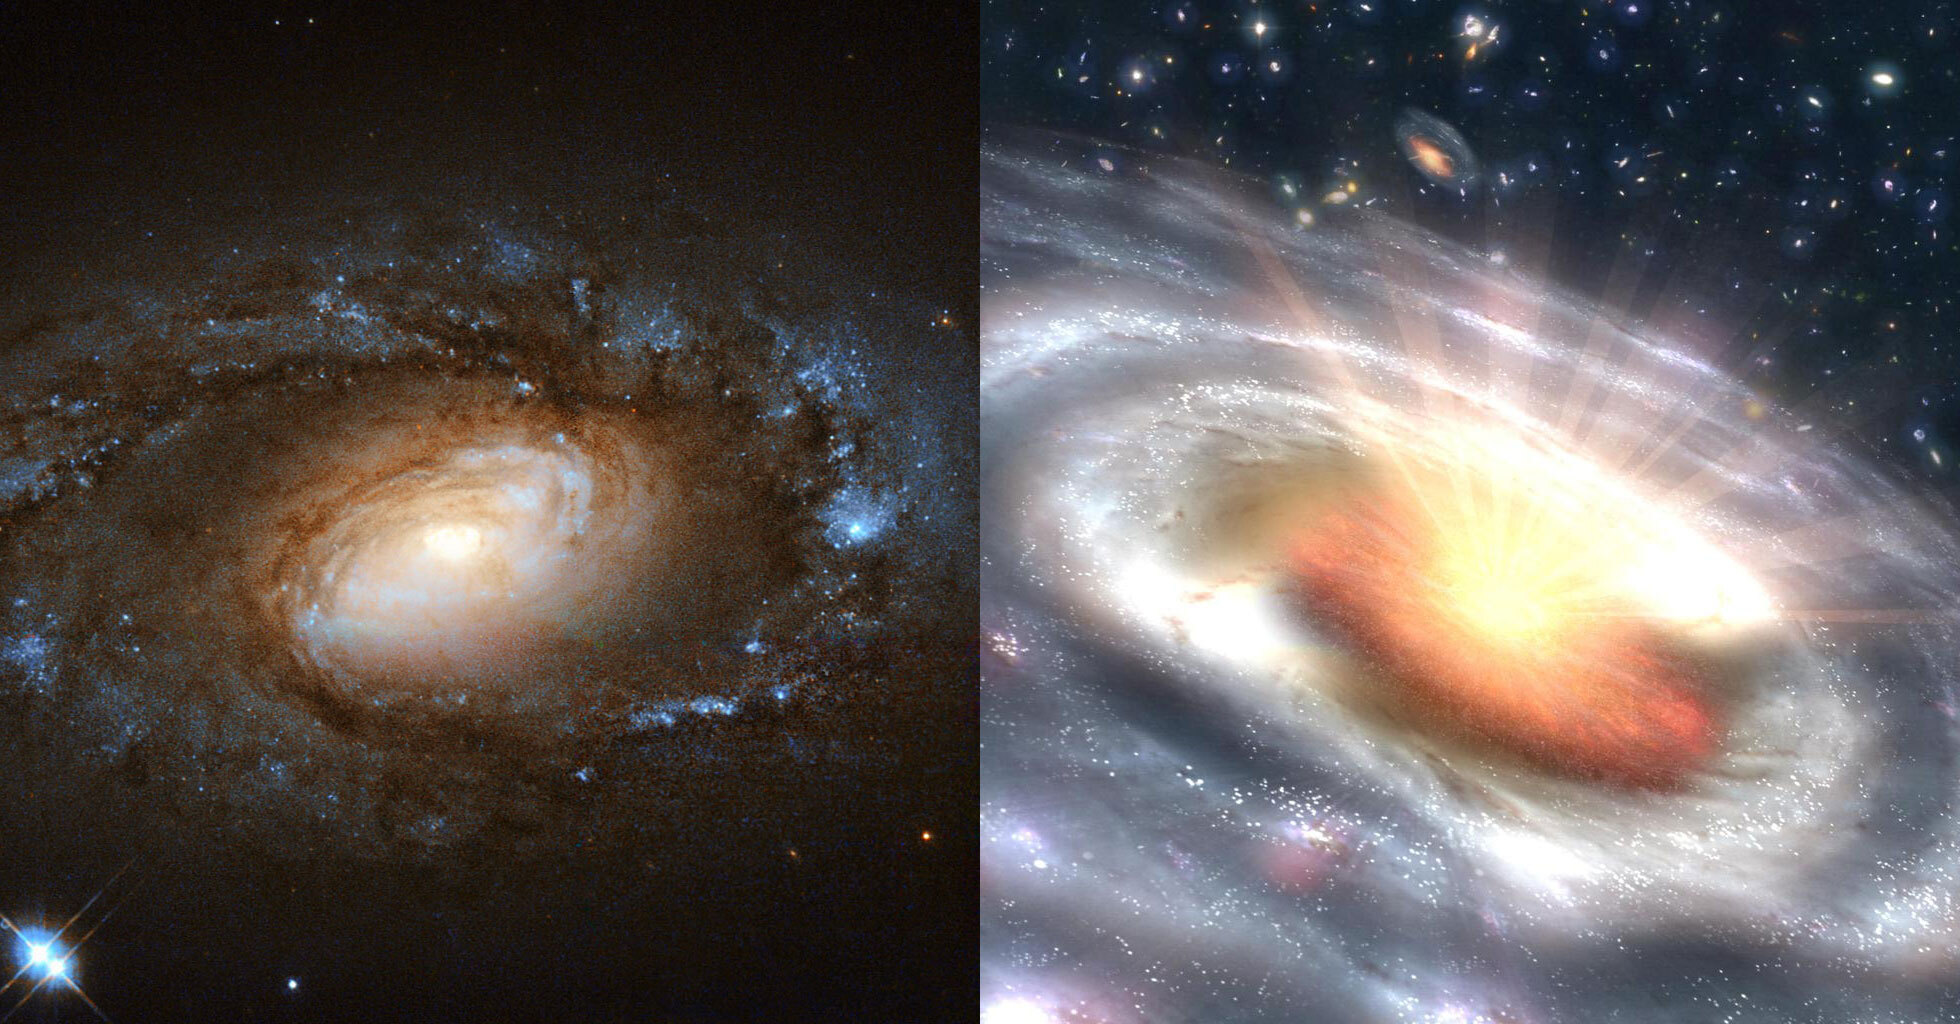 'Dramatic' black holes stun scientists as 'wimpy' galaxies quickly transform into 'ravenous' quasars